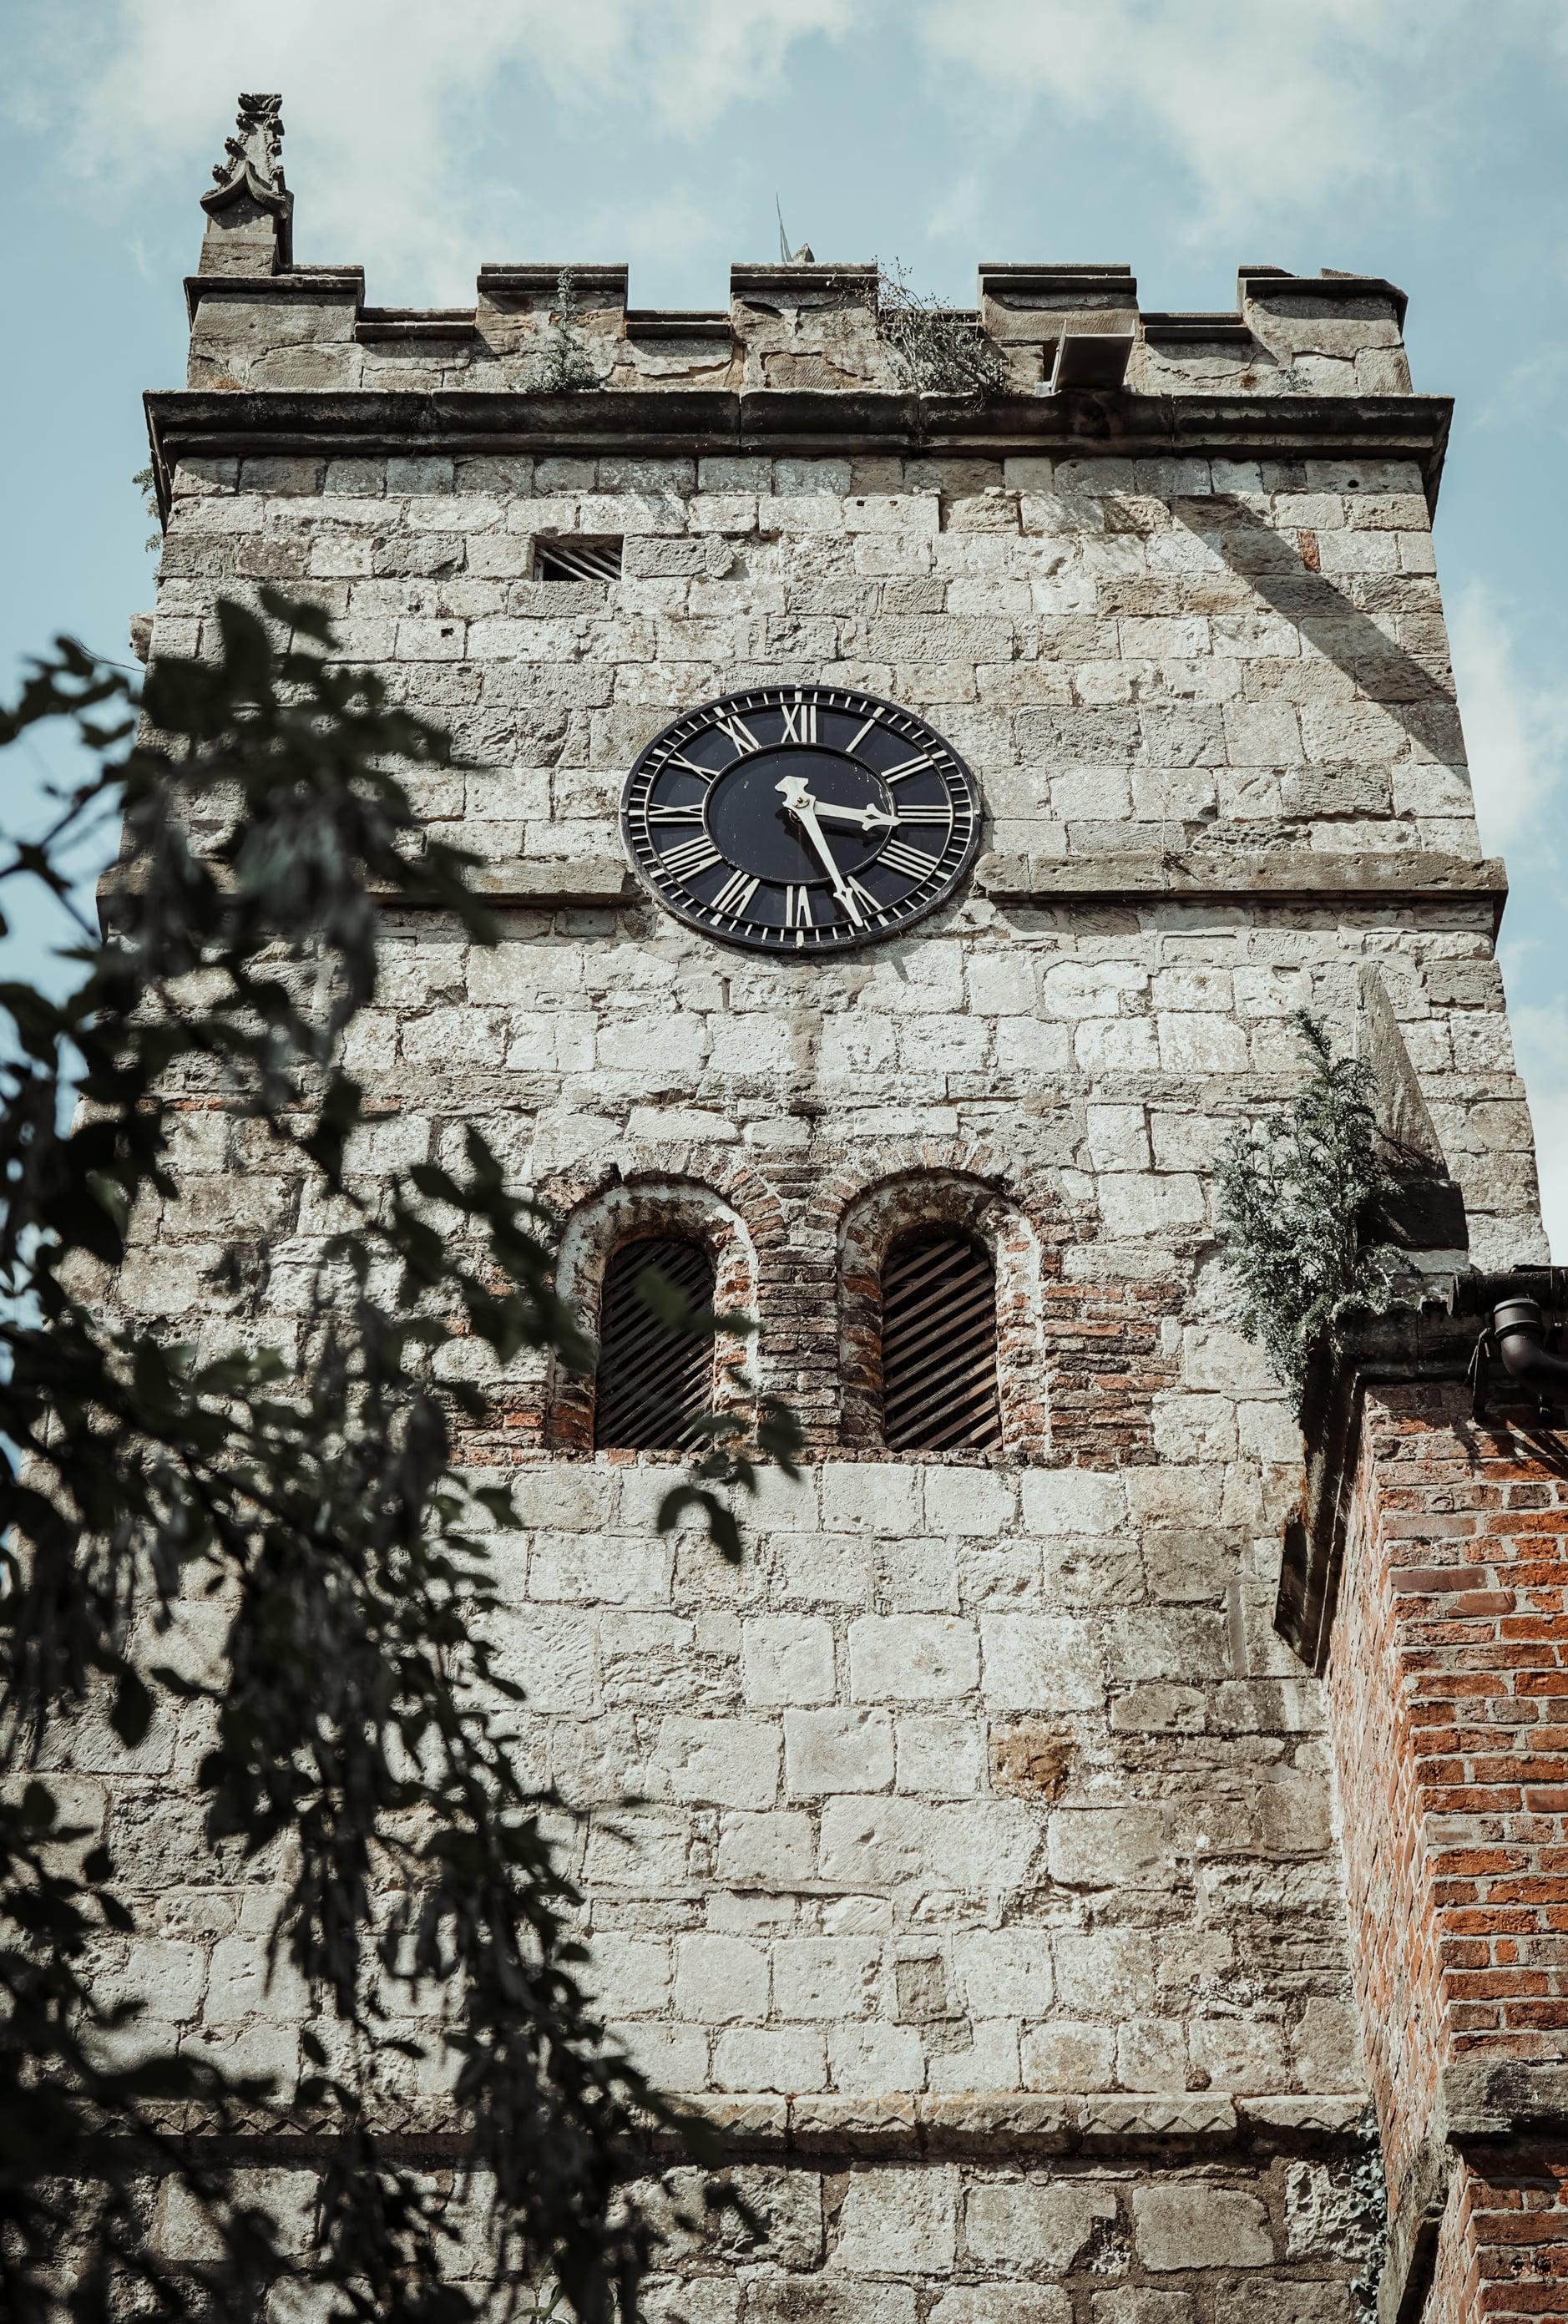 St Everilda's Church in Everingham